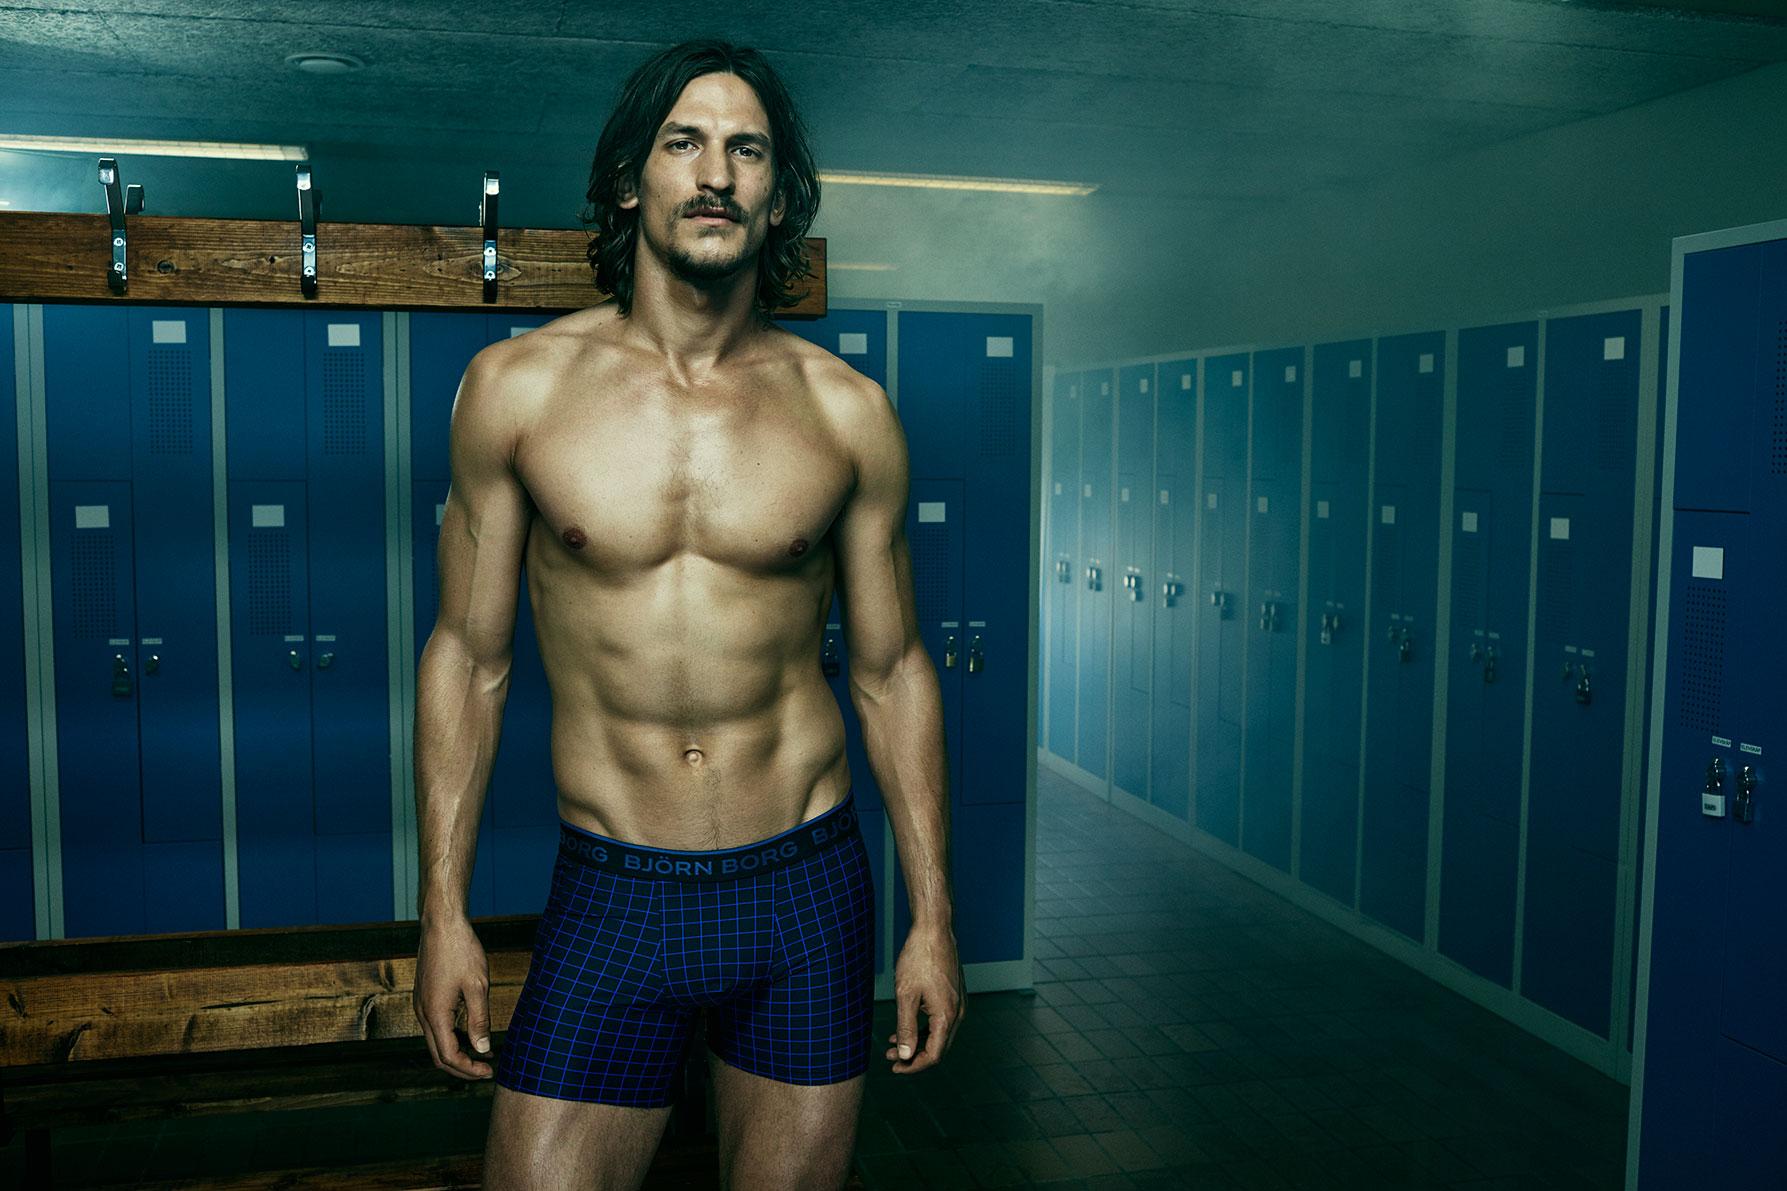 Bj/örn Borg Mens Sports Underwear